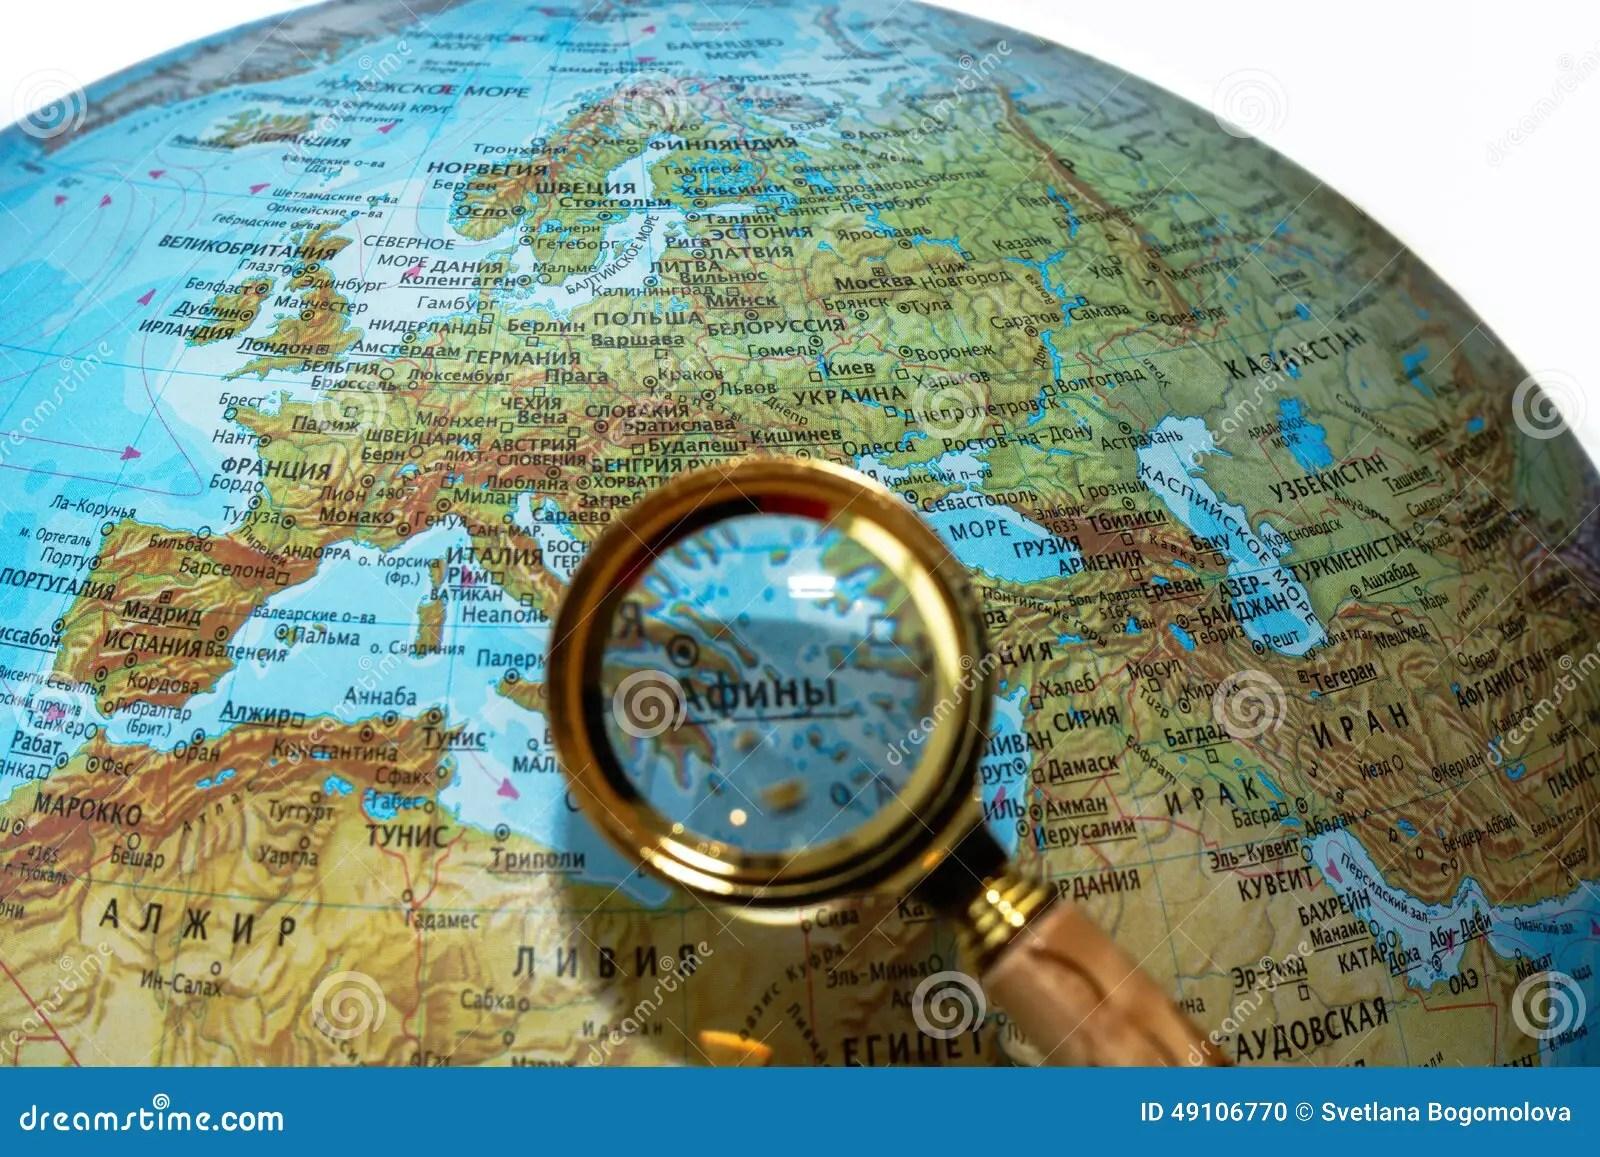 Greece On The Globe Afp Cv